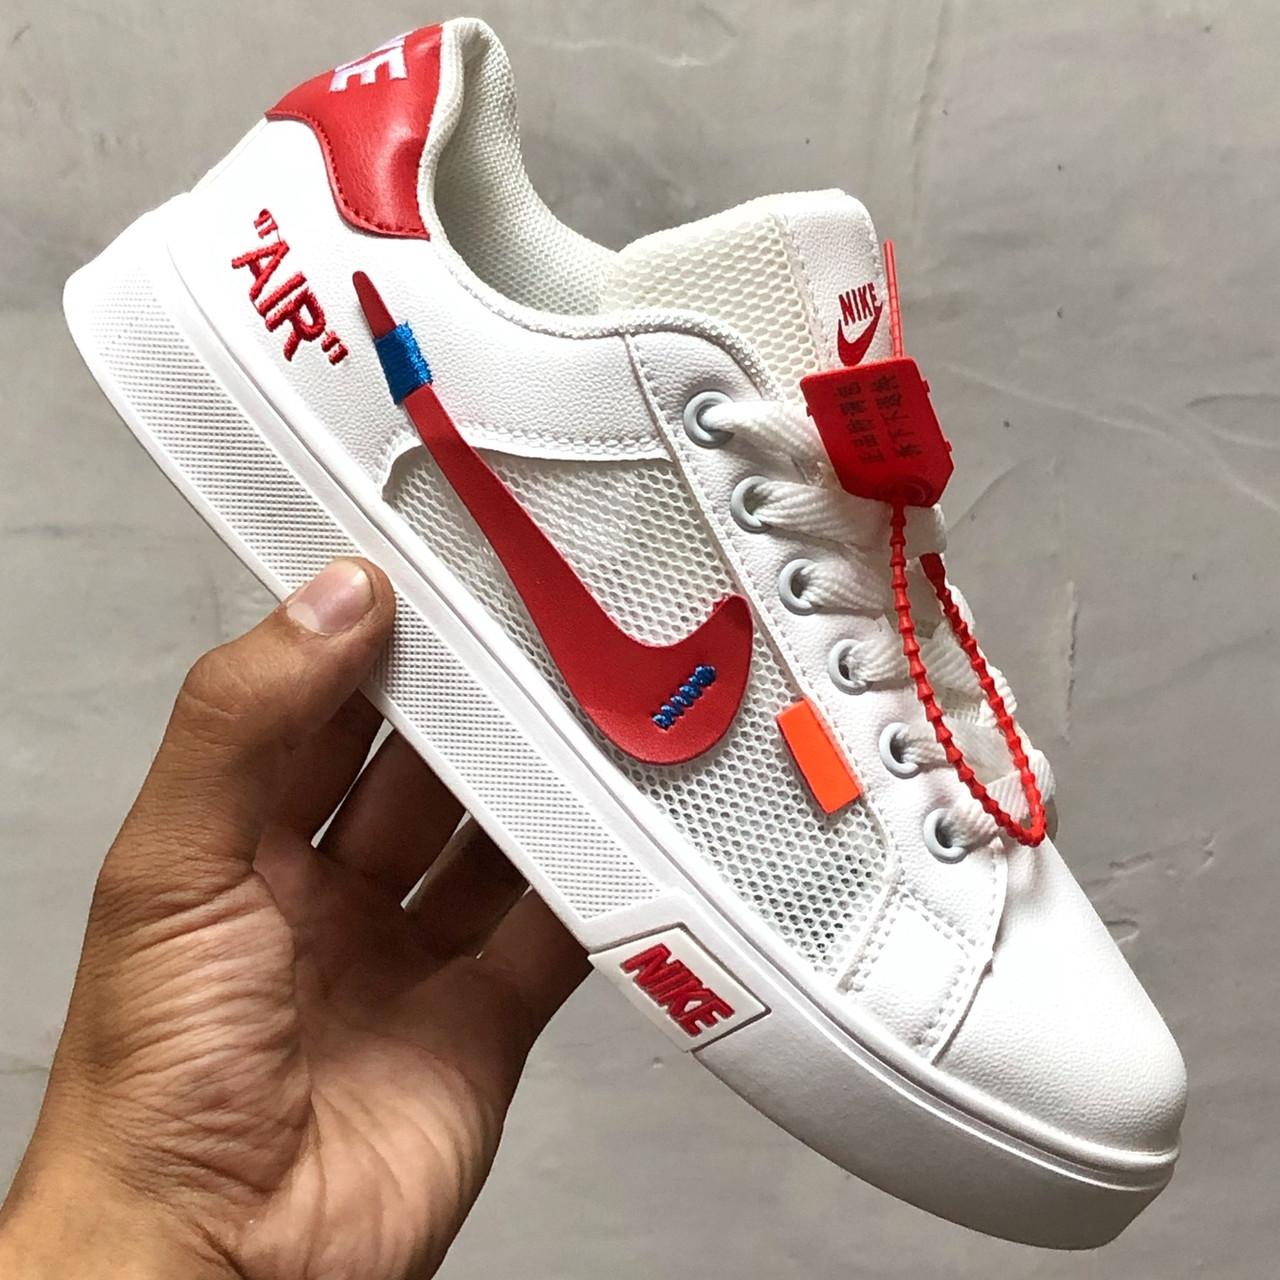 Кроссовки женские Nike Blazer Mid Off-White белые-красные (Top replic)